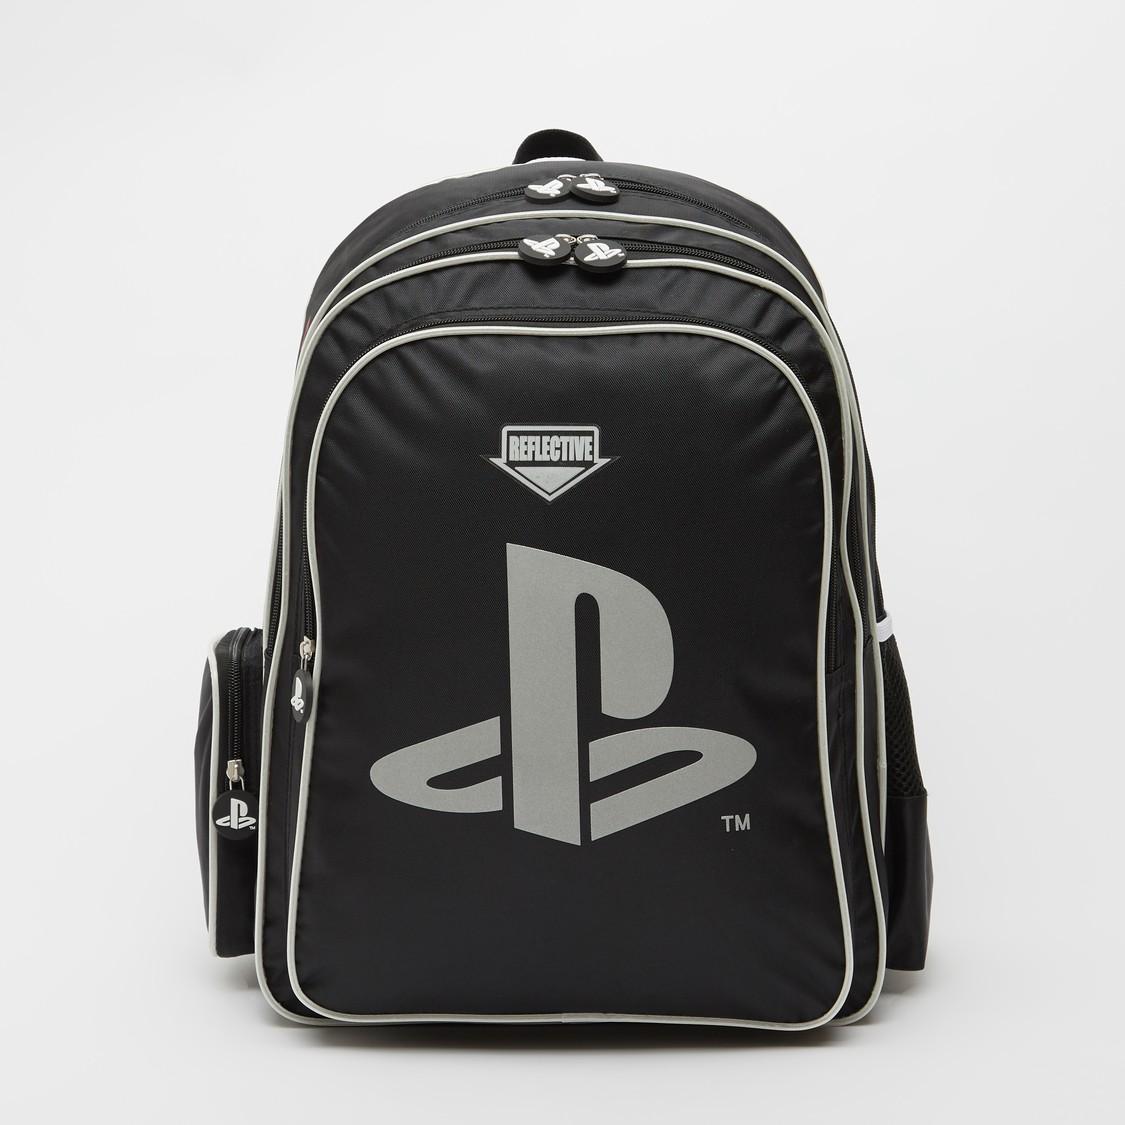 PlayStation Print Backpack with Adjustable Shoulder Straps - 18 Inches